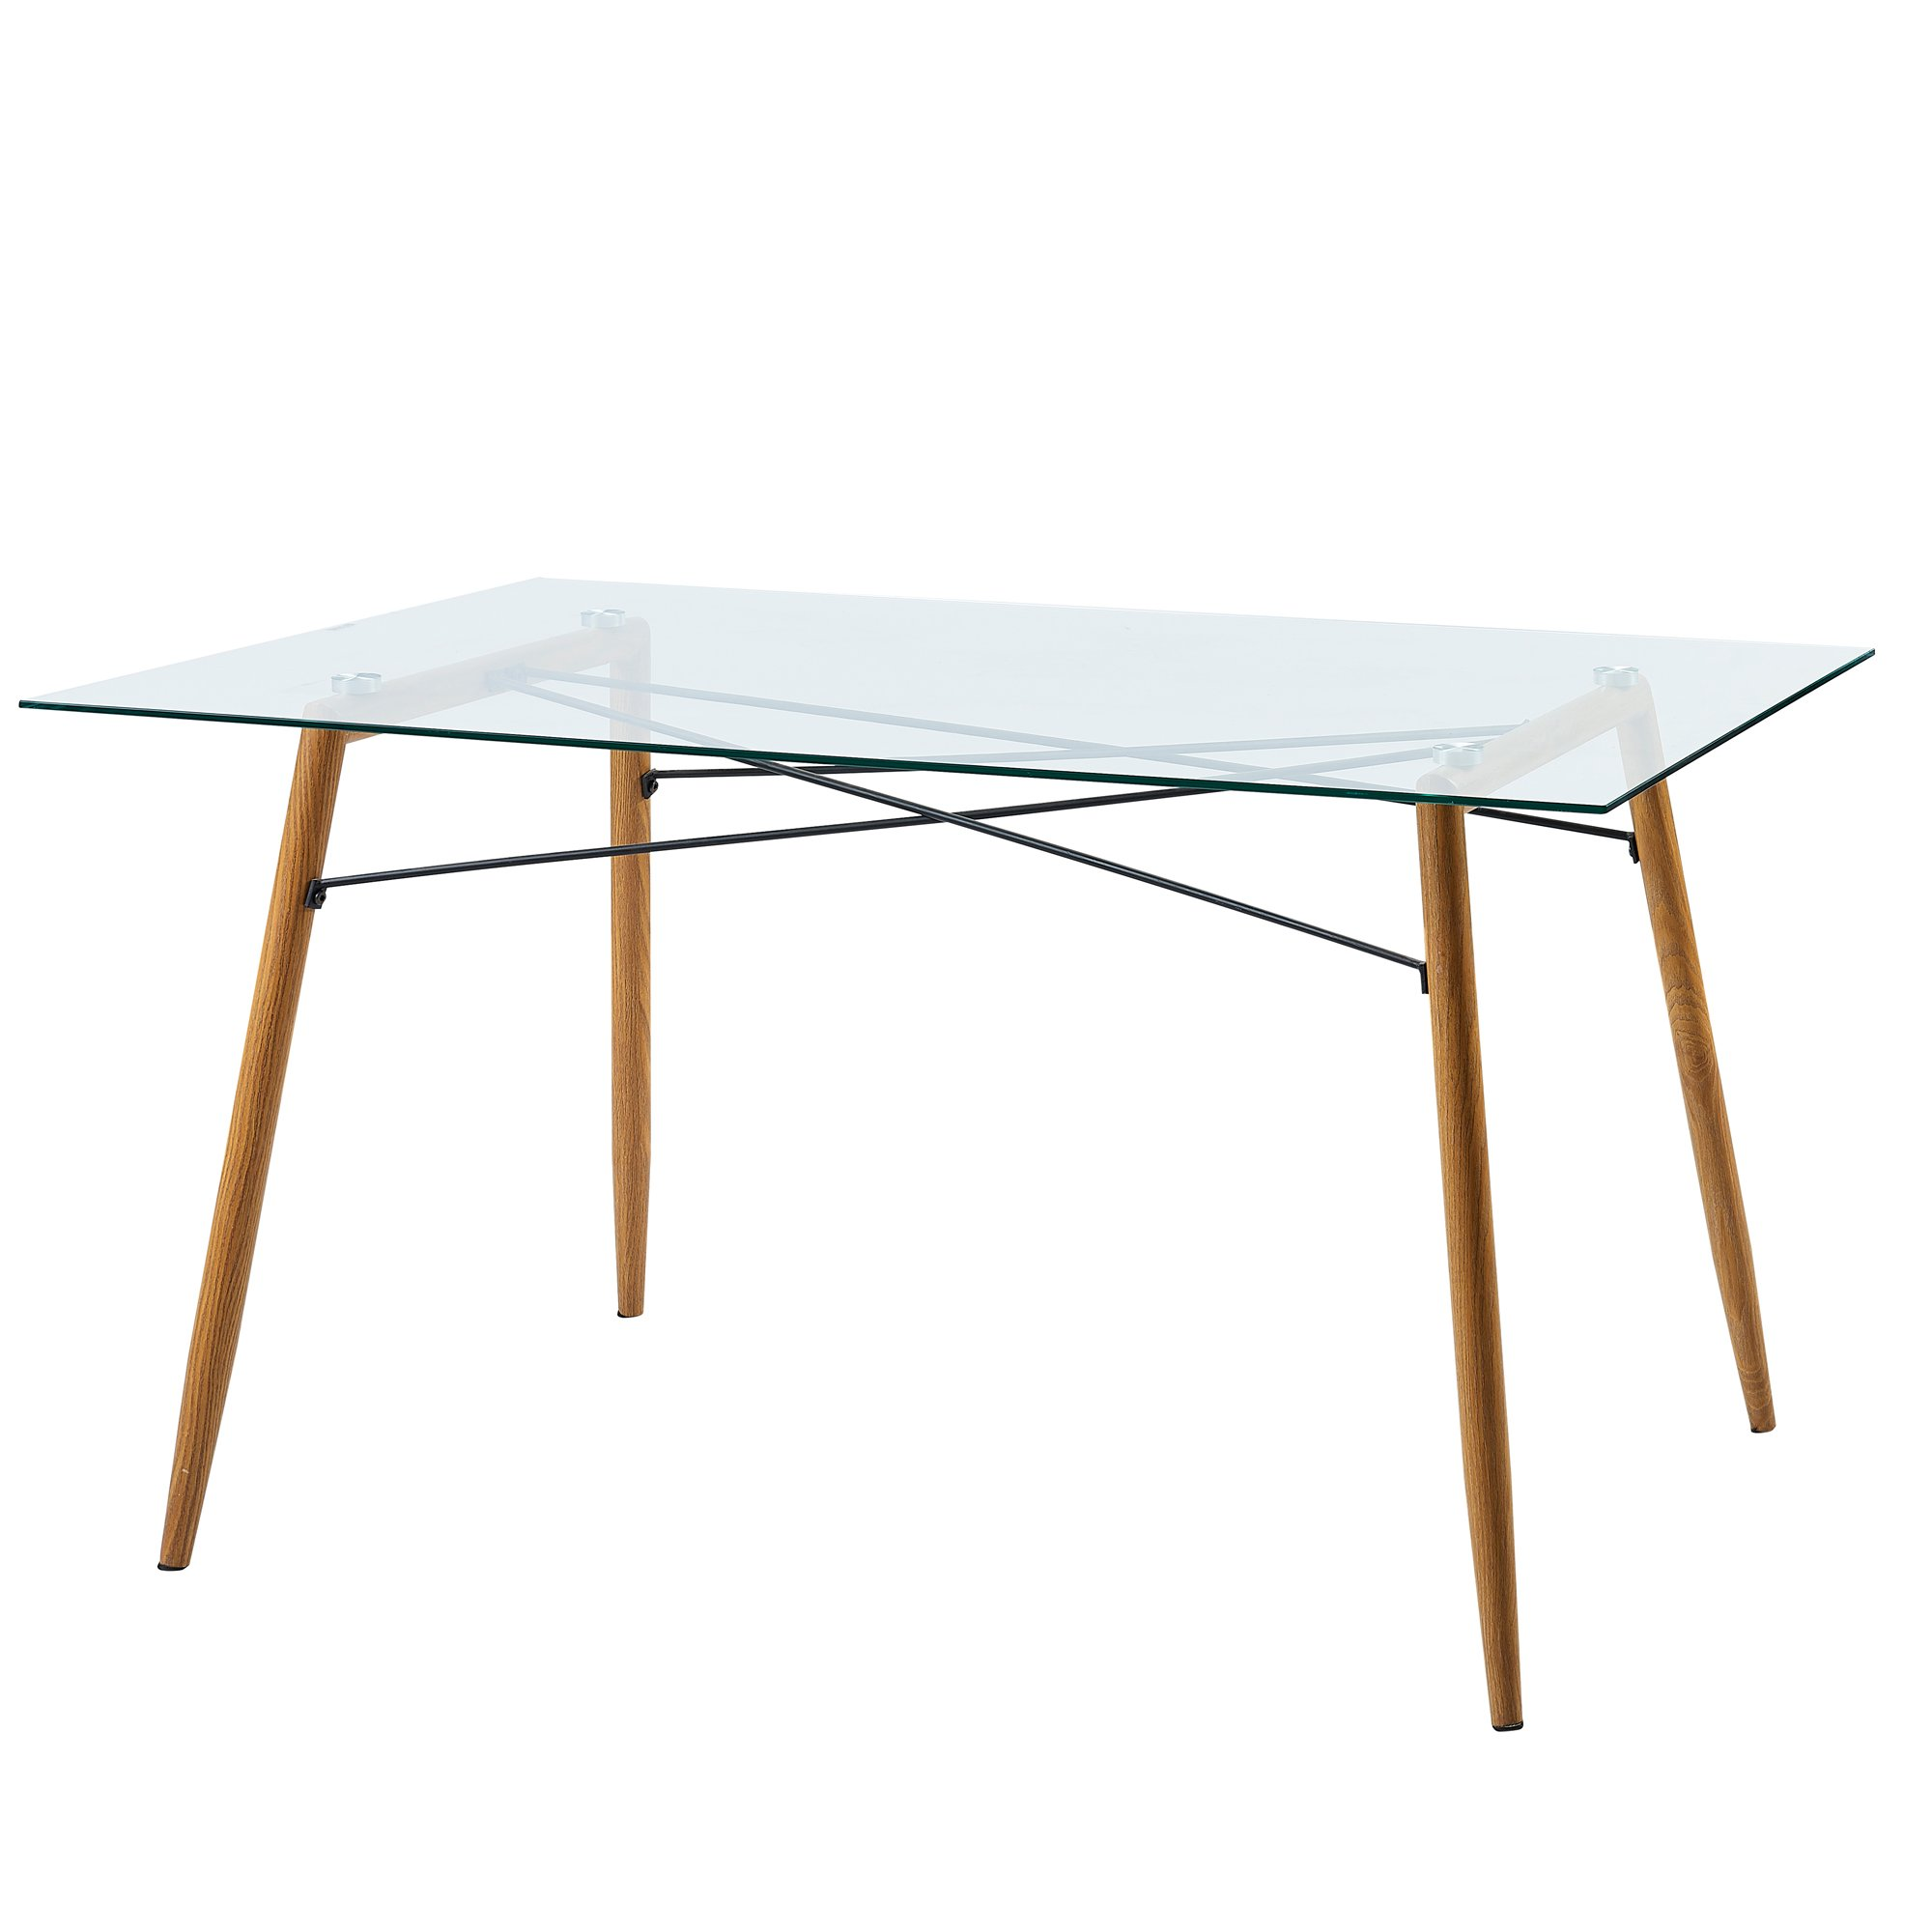 Versanora VNF-00026 Minimalista Dining Tables, Glass Top/Wood Grain Leg by Versanora